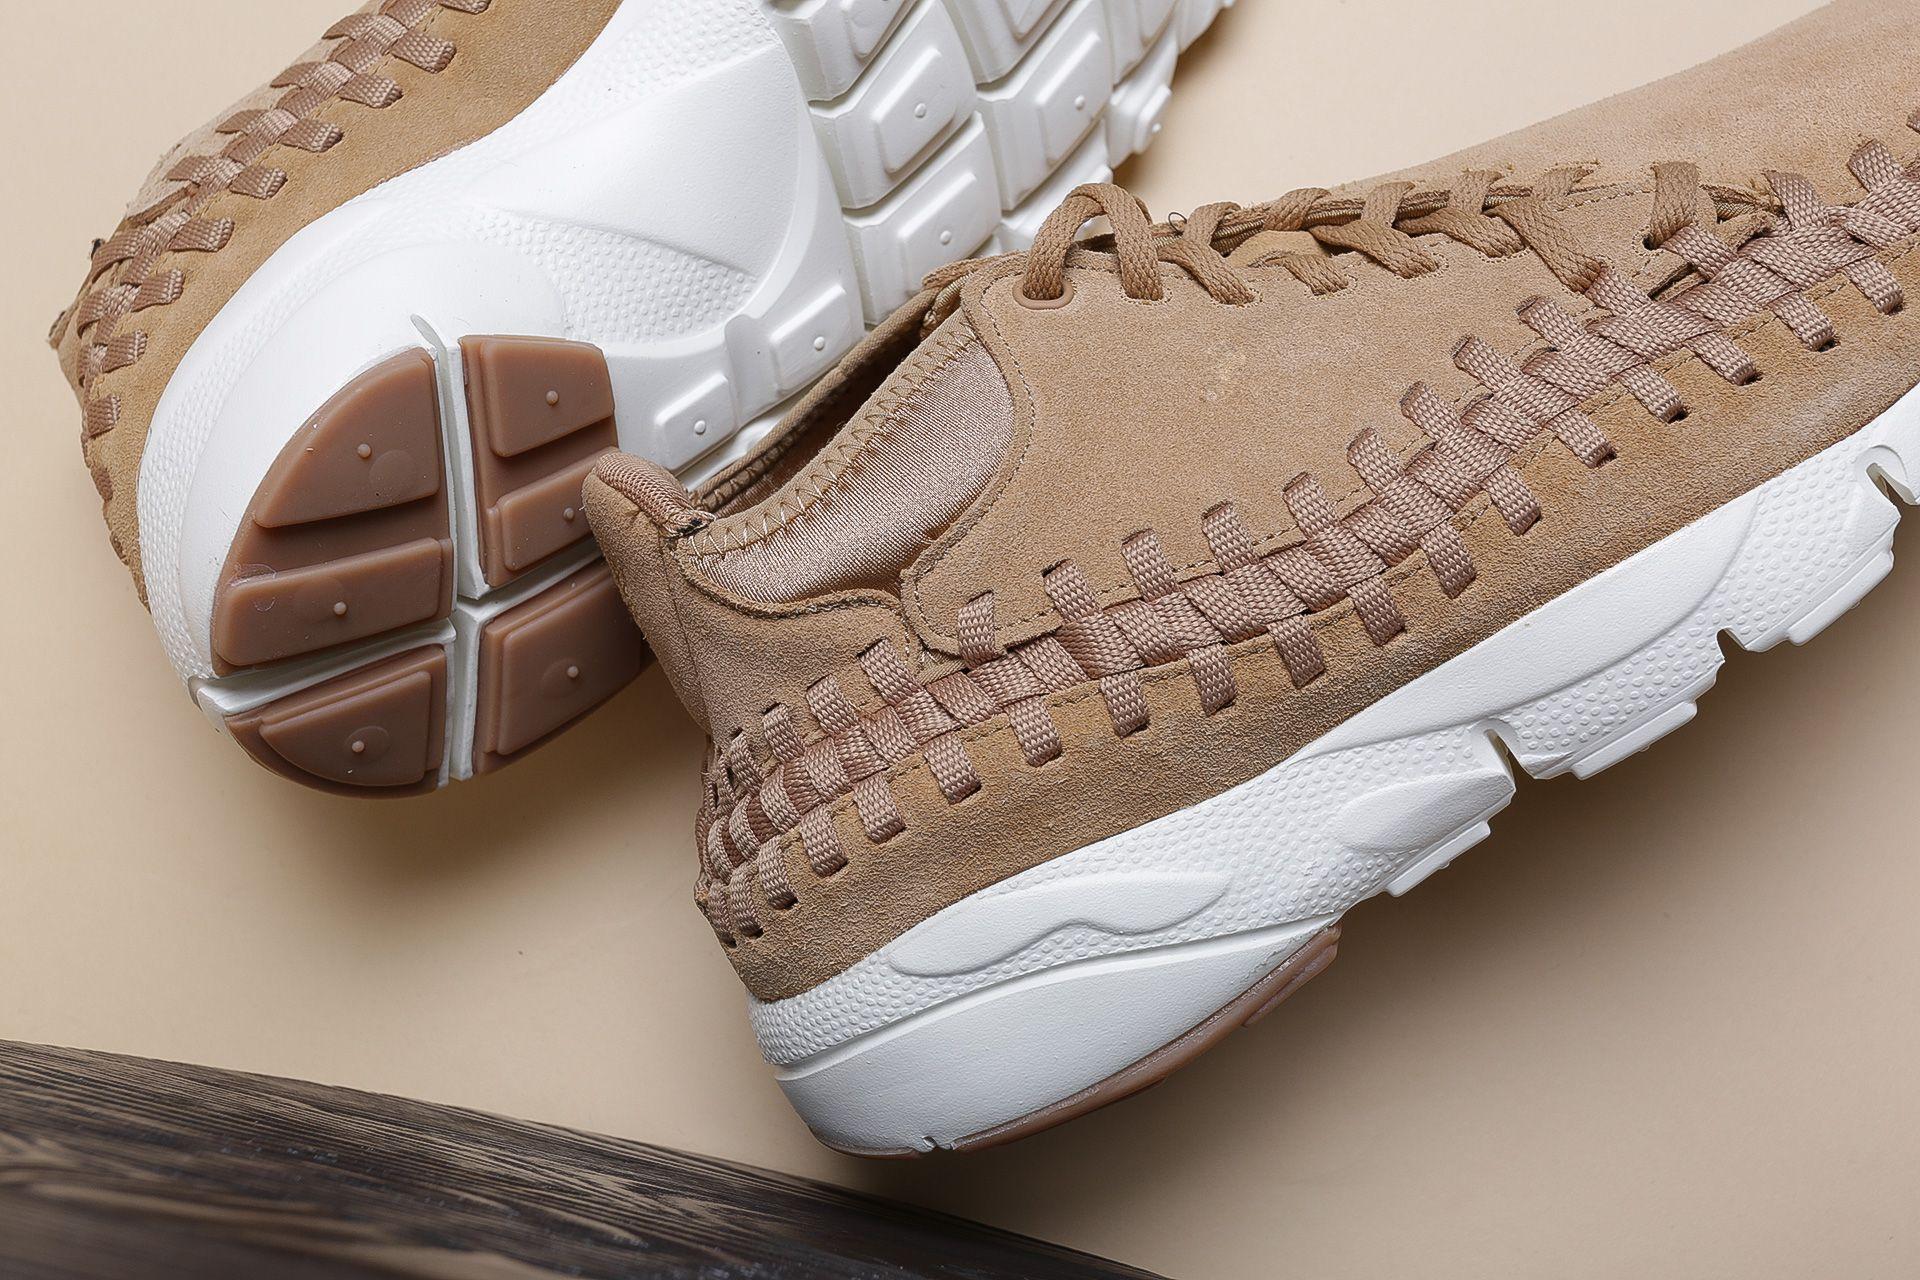 sports shoes 4bcda b86f8 ... Купить мужские кроссовки Nike Air Footscape Woven Chukka - фото 3  картинки ...